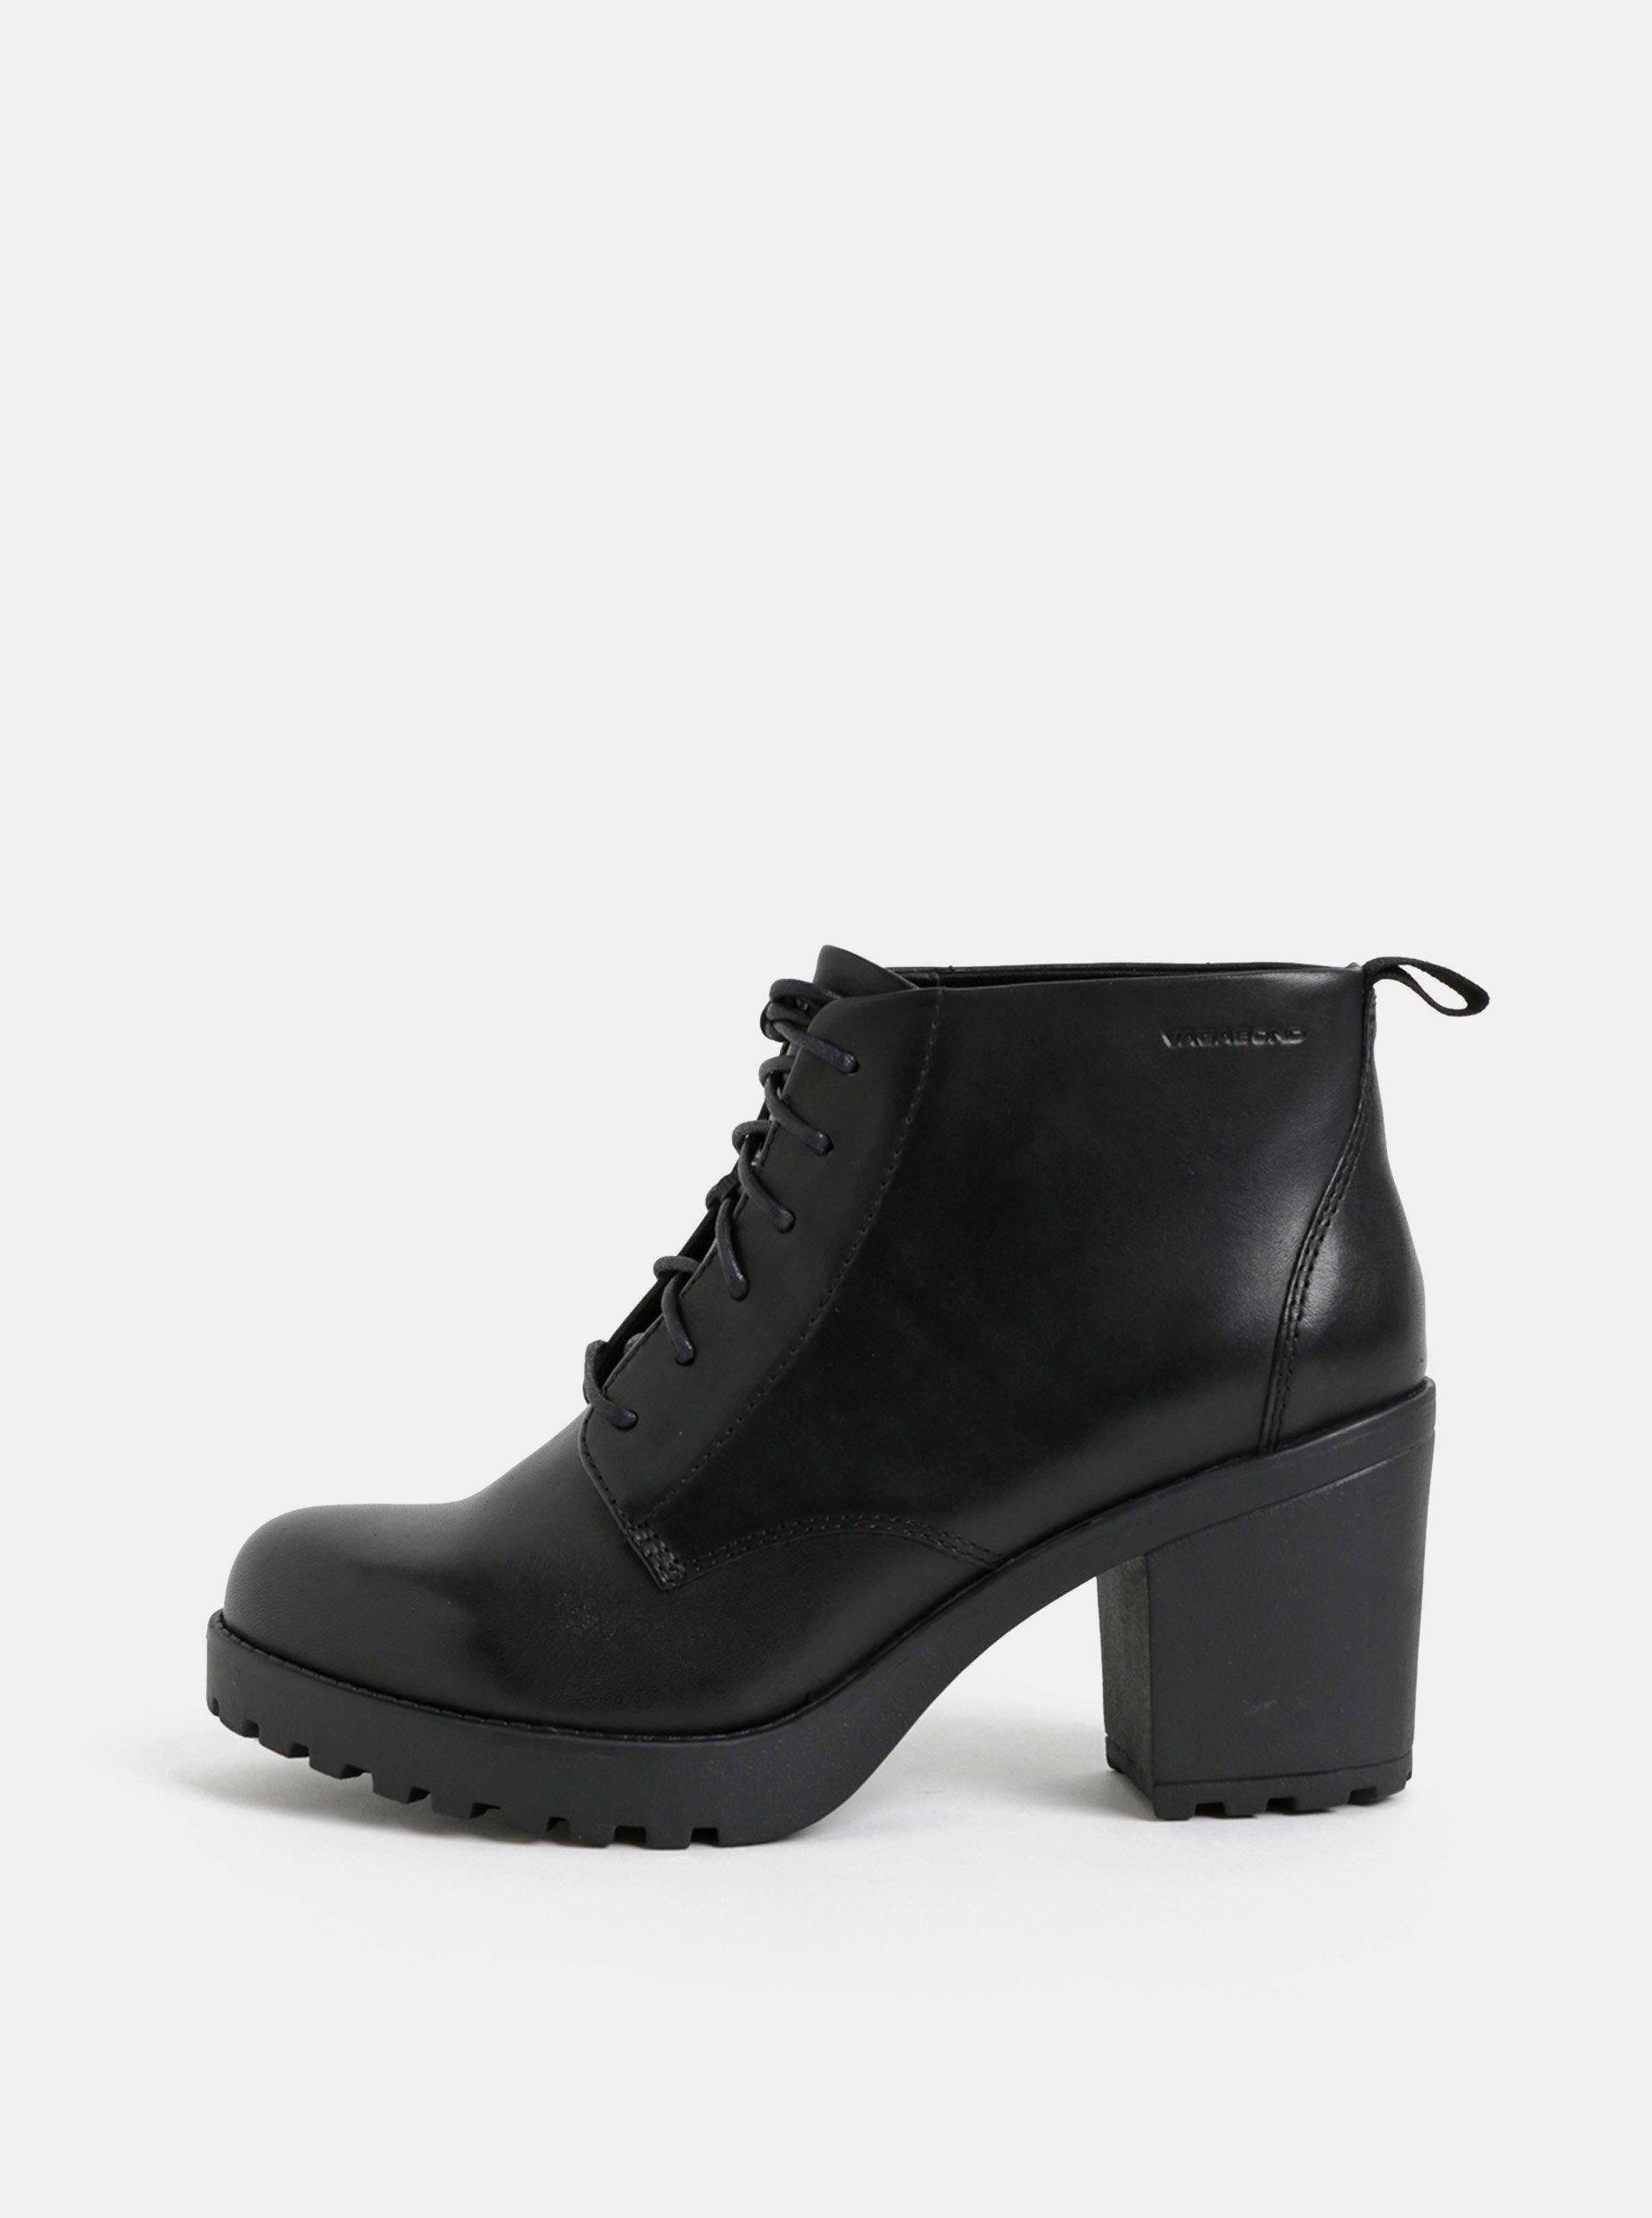 3920f5802e818 Čierne dámske kožené členkové topánky na podpätku Vagabond Grace